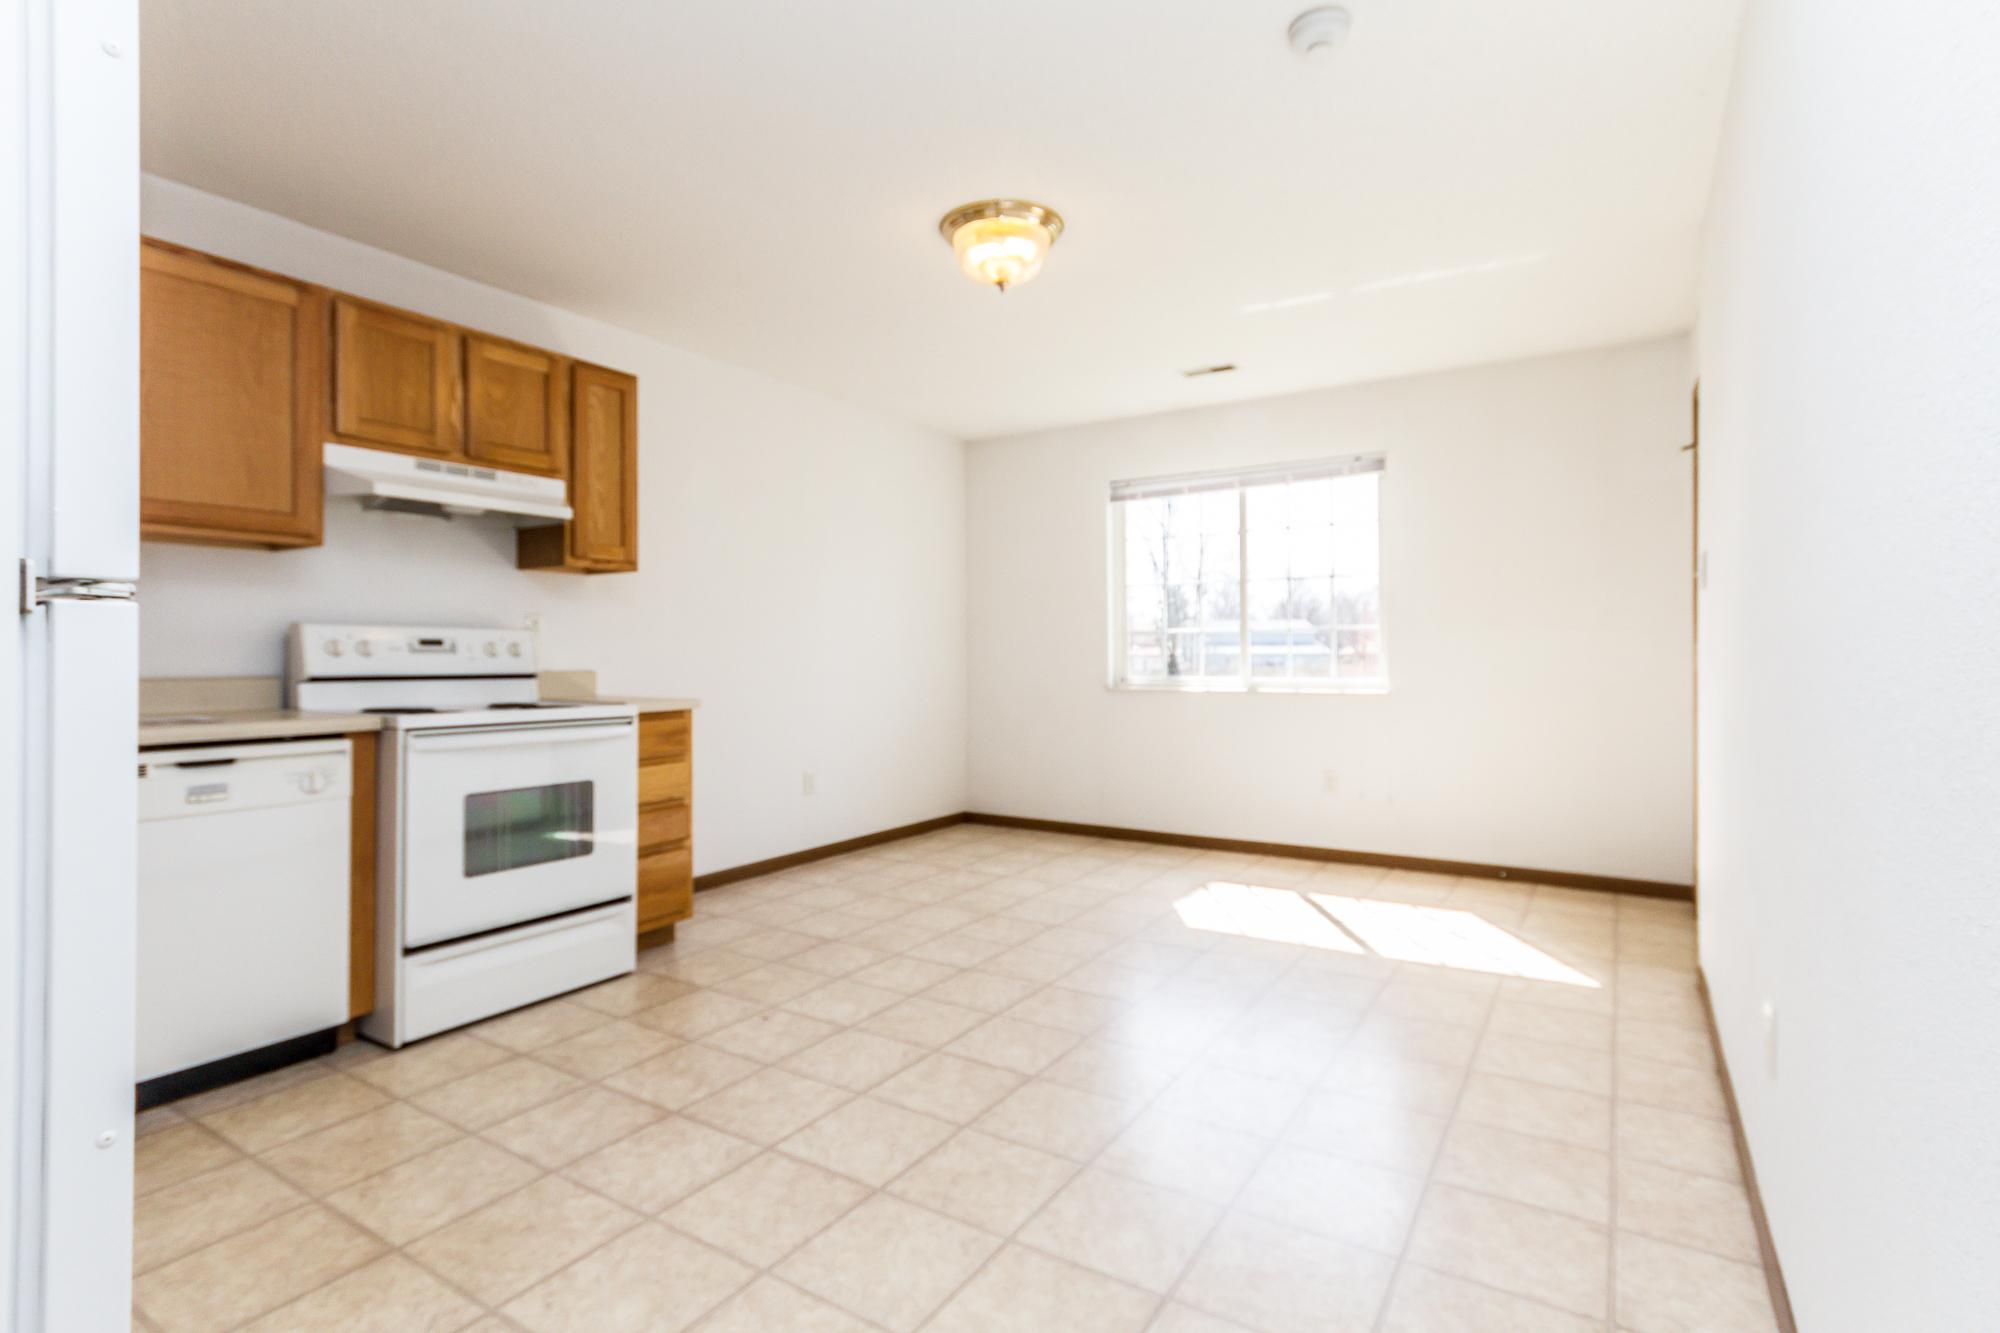 Brookside-Apartments-O'Fallon-Illinois-12.jpg